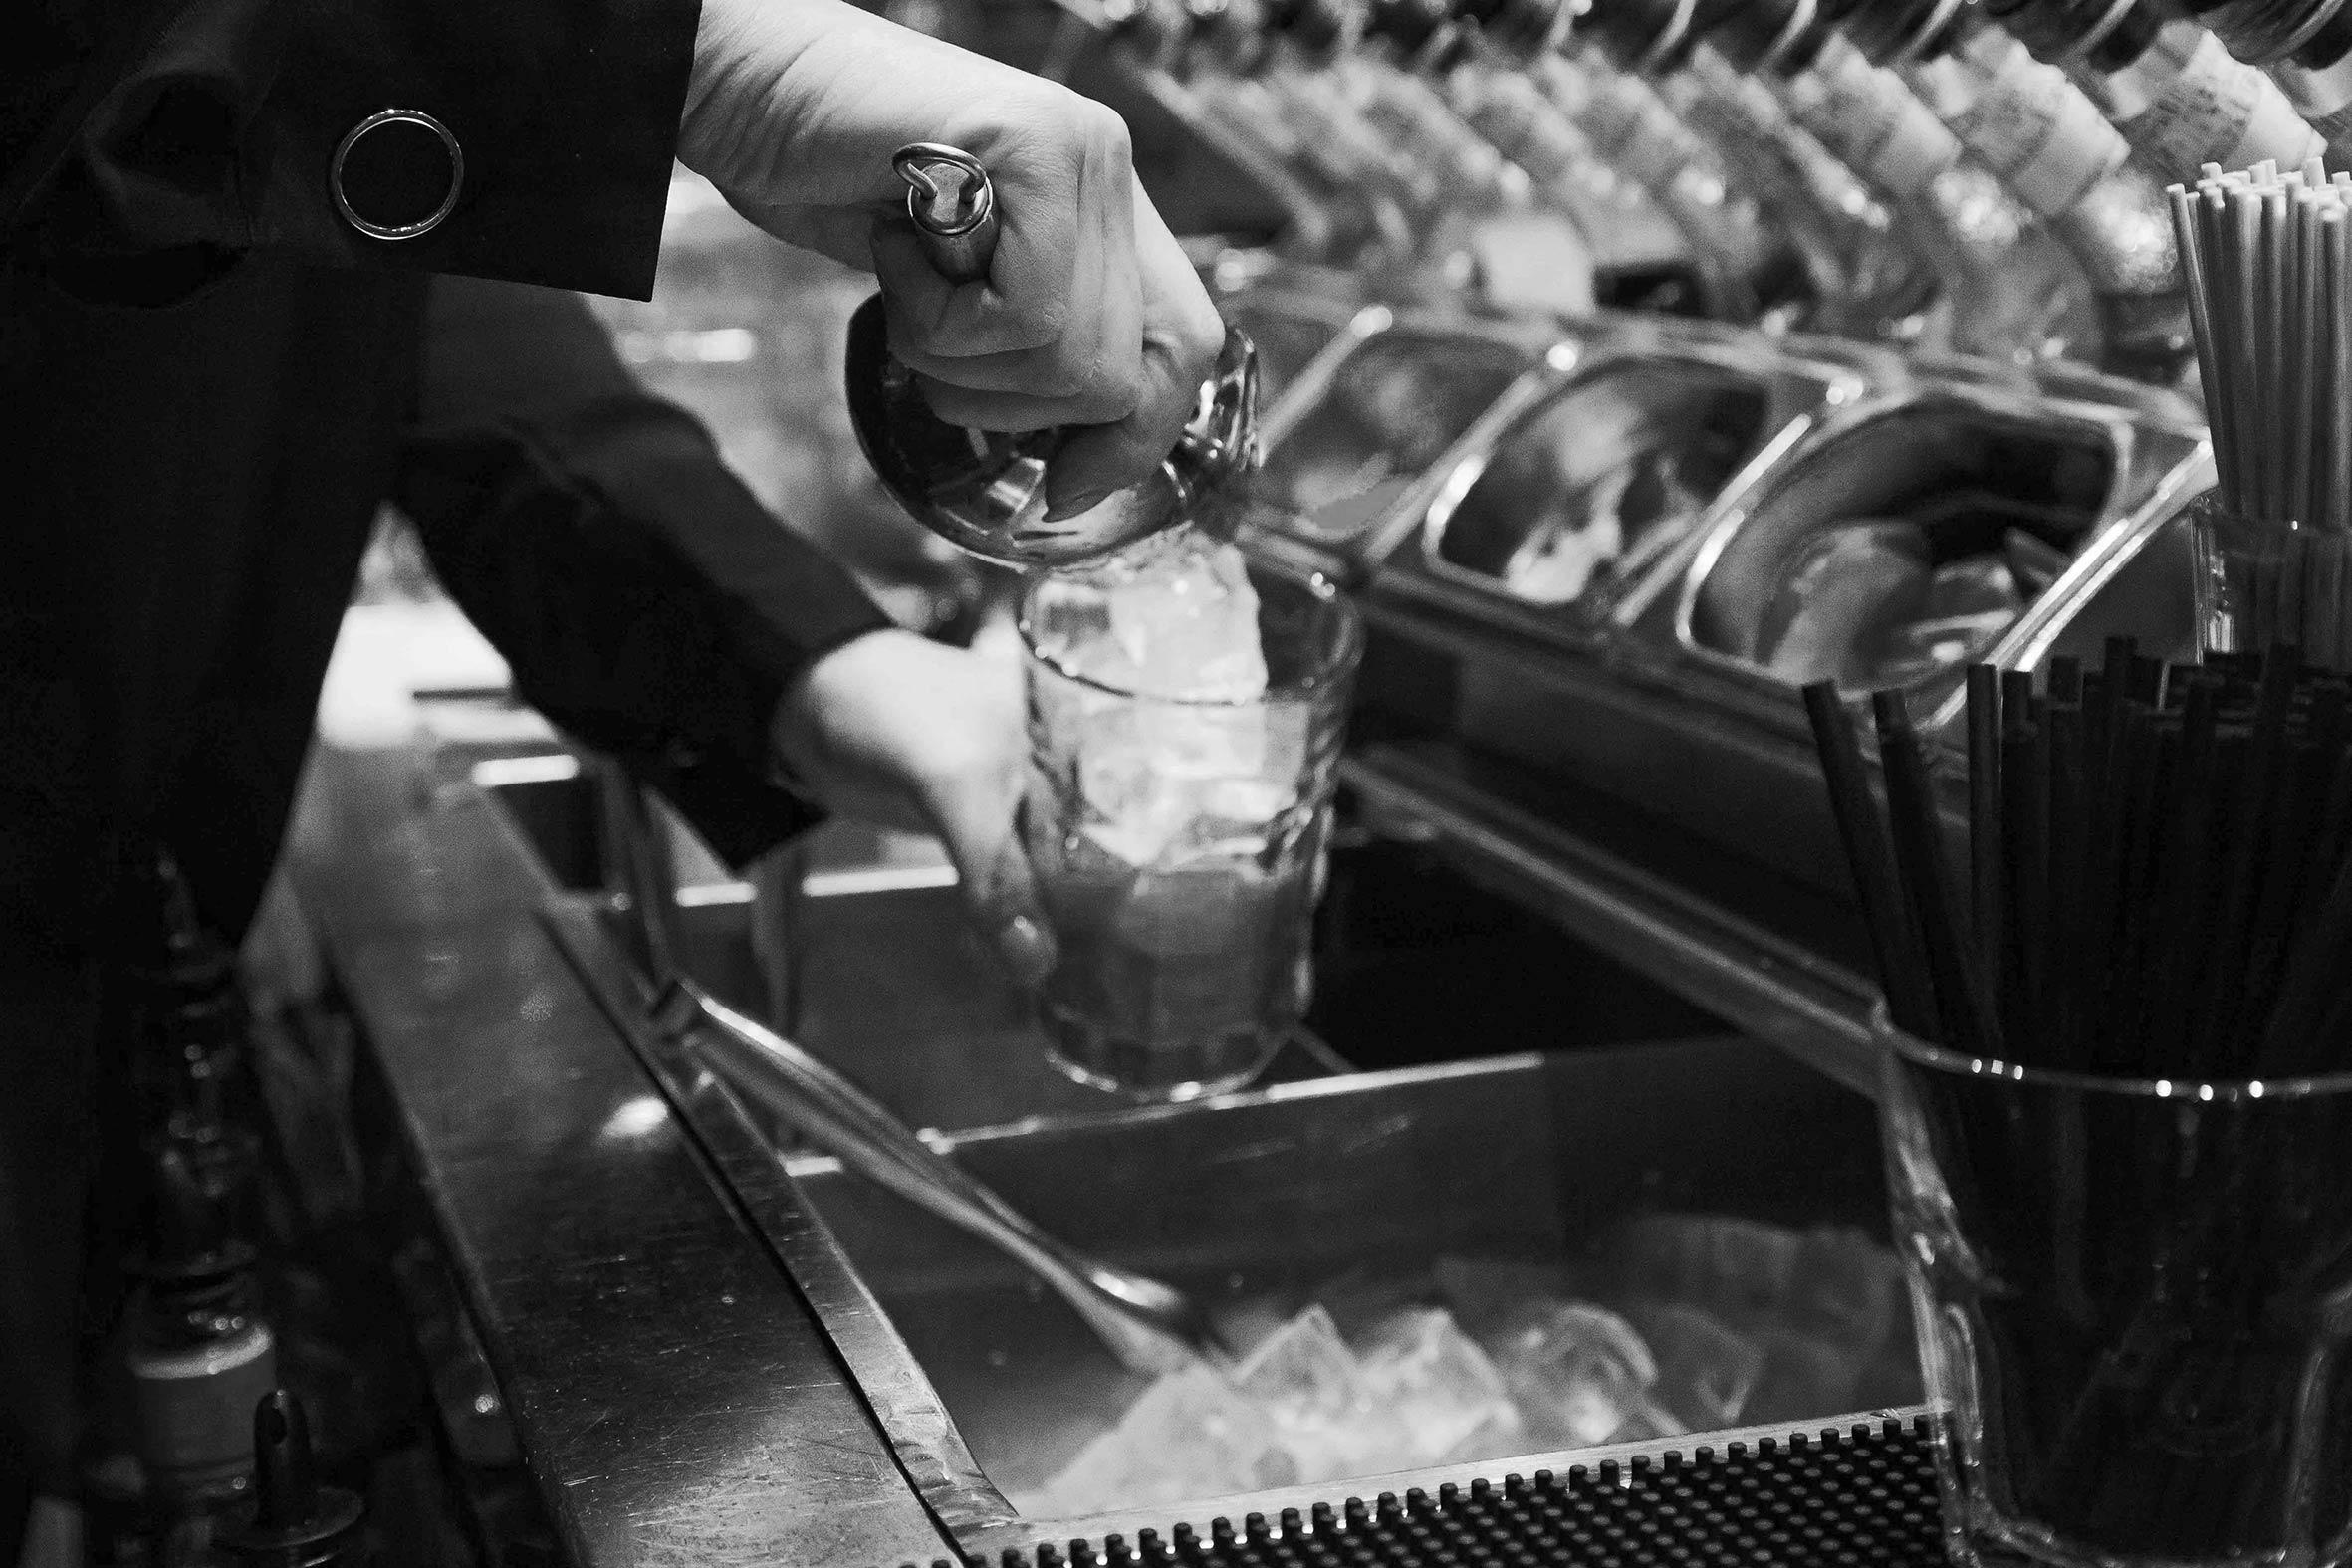 rosalys-restaurant-bar-zuerich-mixing-cocktails